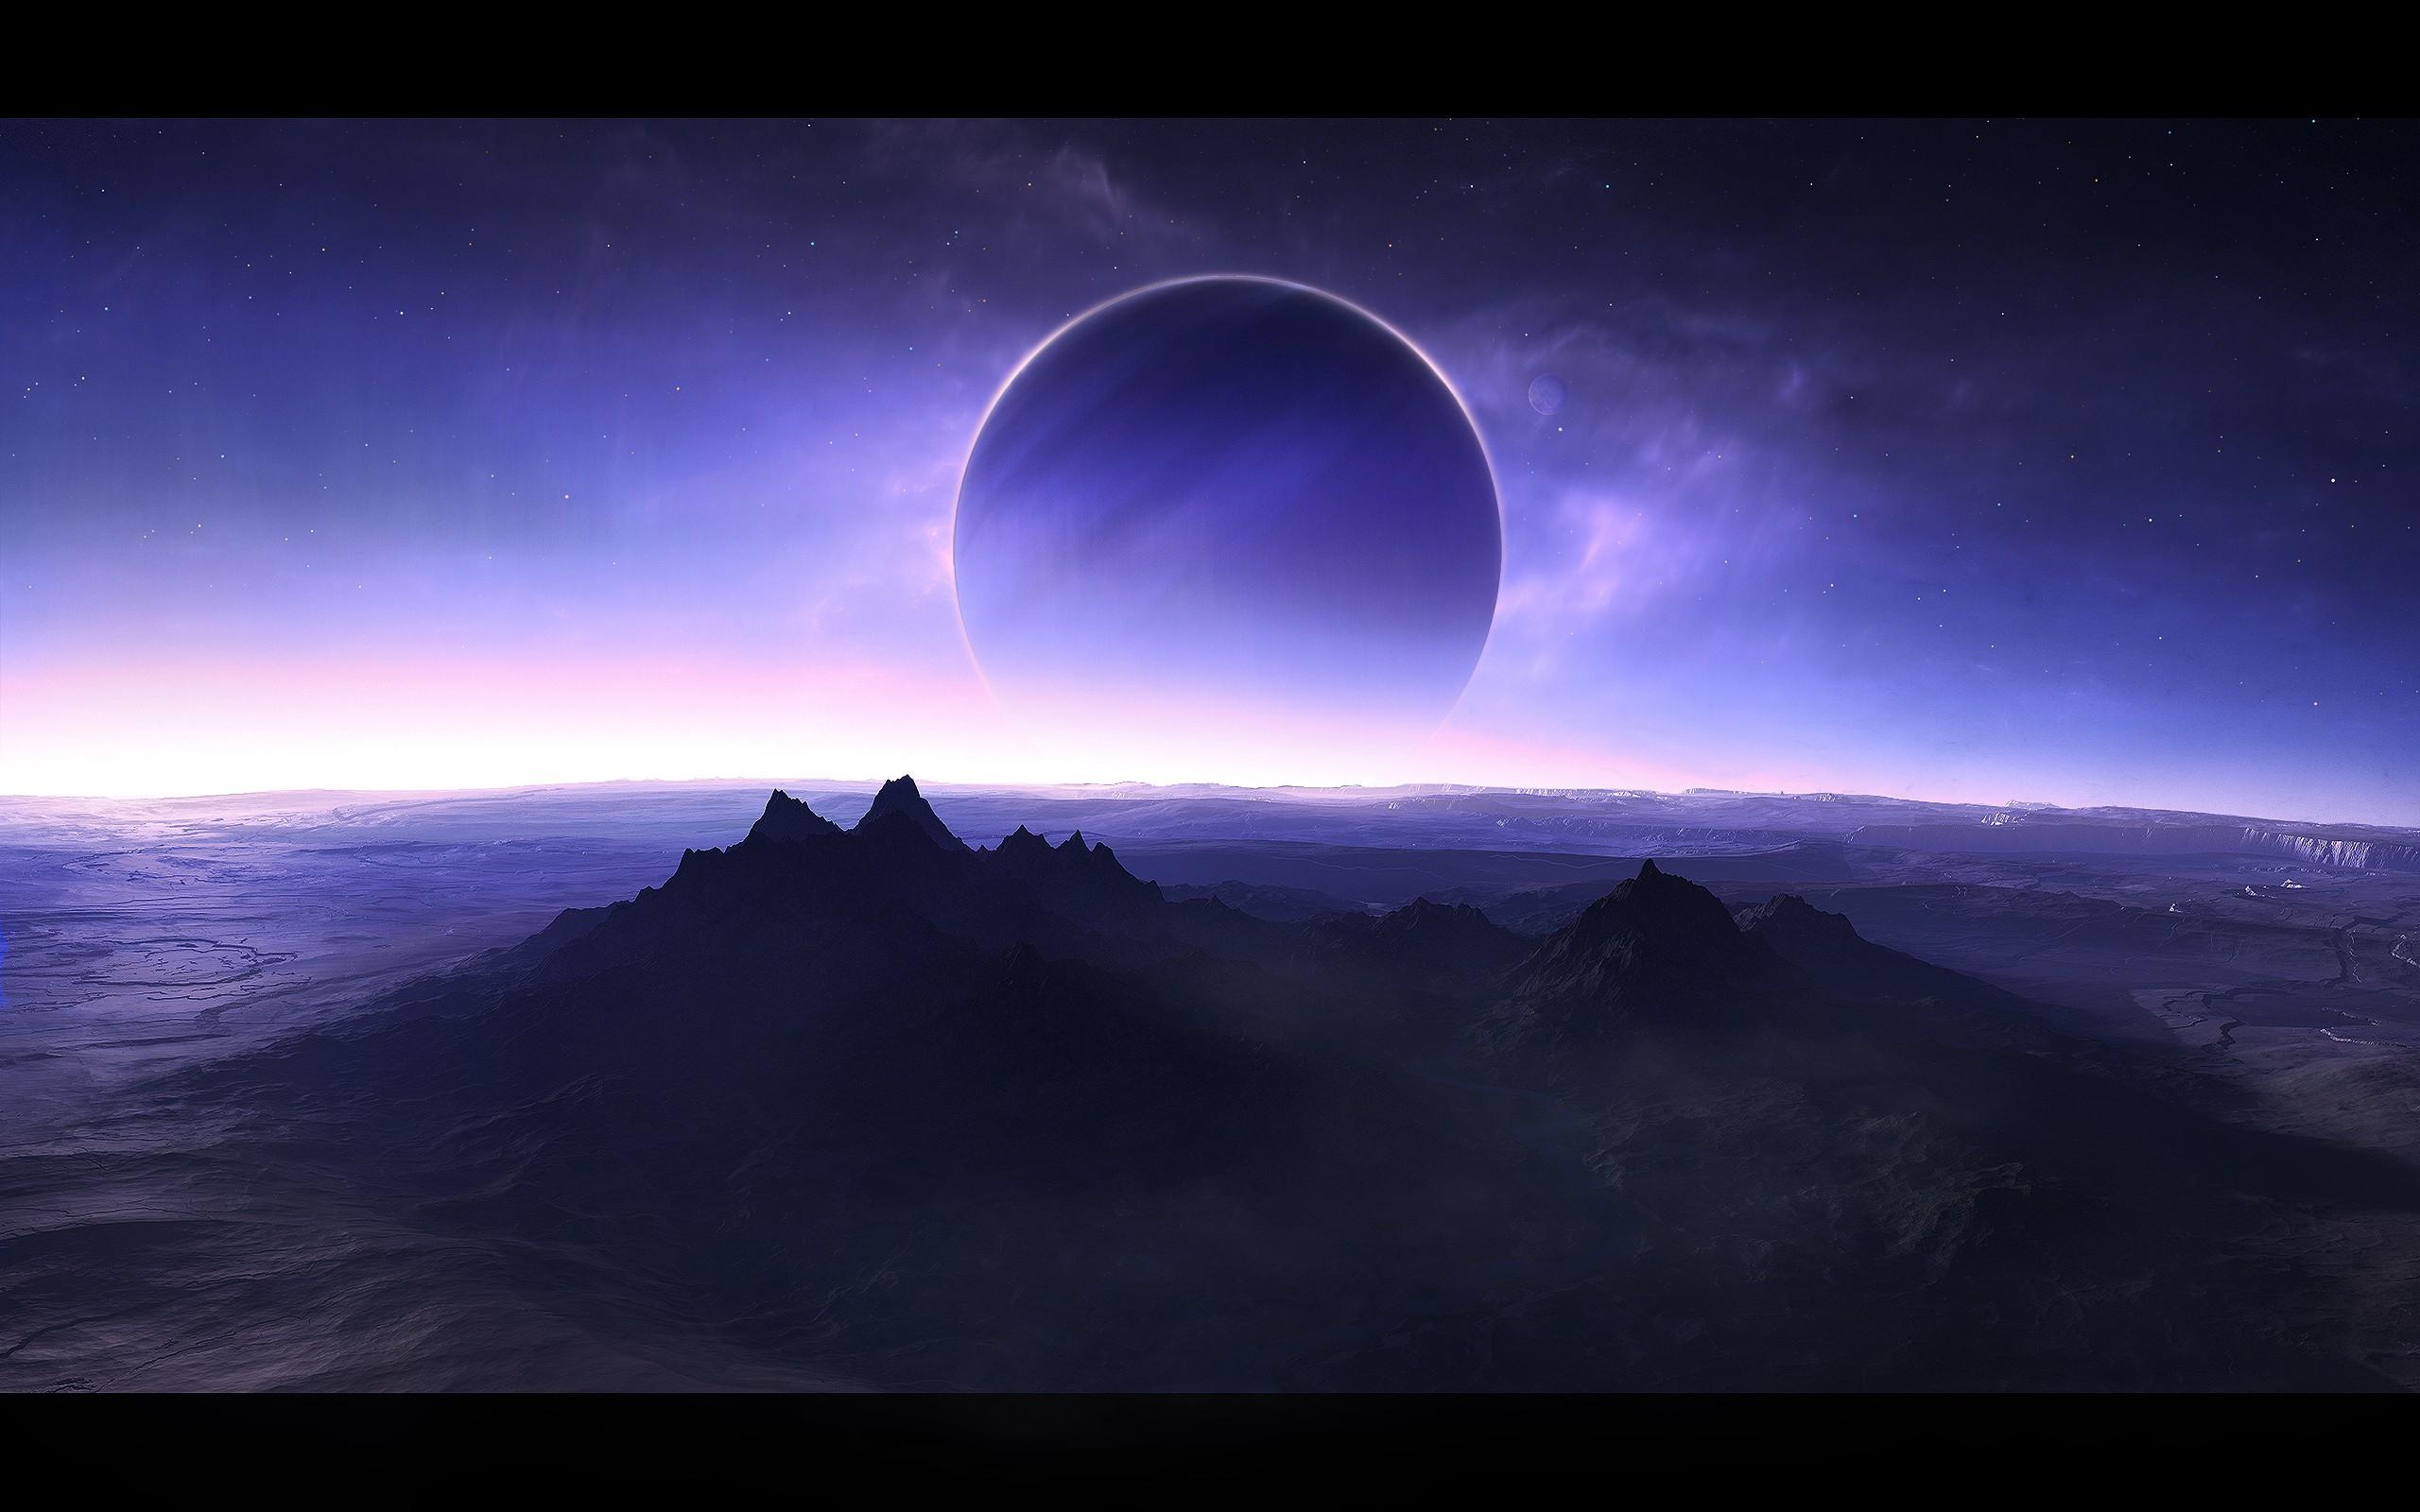 Allah Desktop Wallpapers Hd Scifi Twilight Hd Digital Universe 4k Wallpapers Images